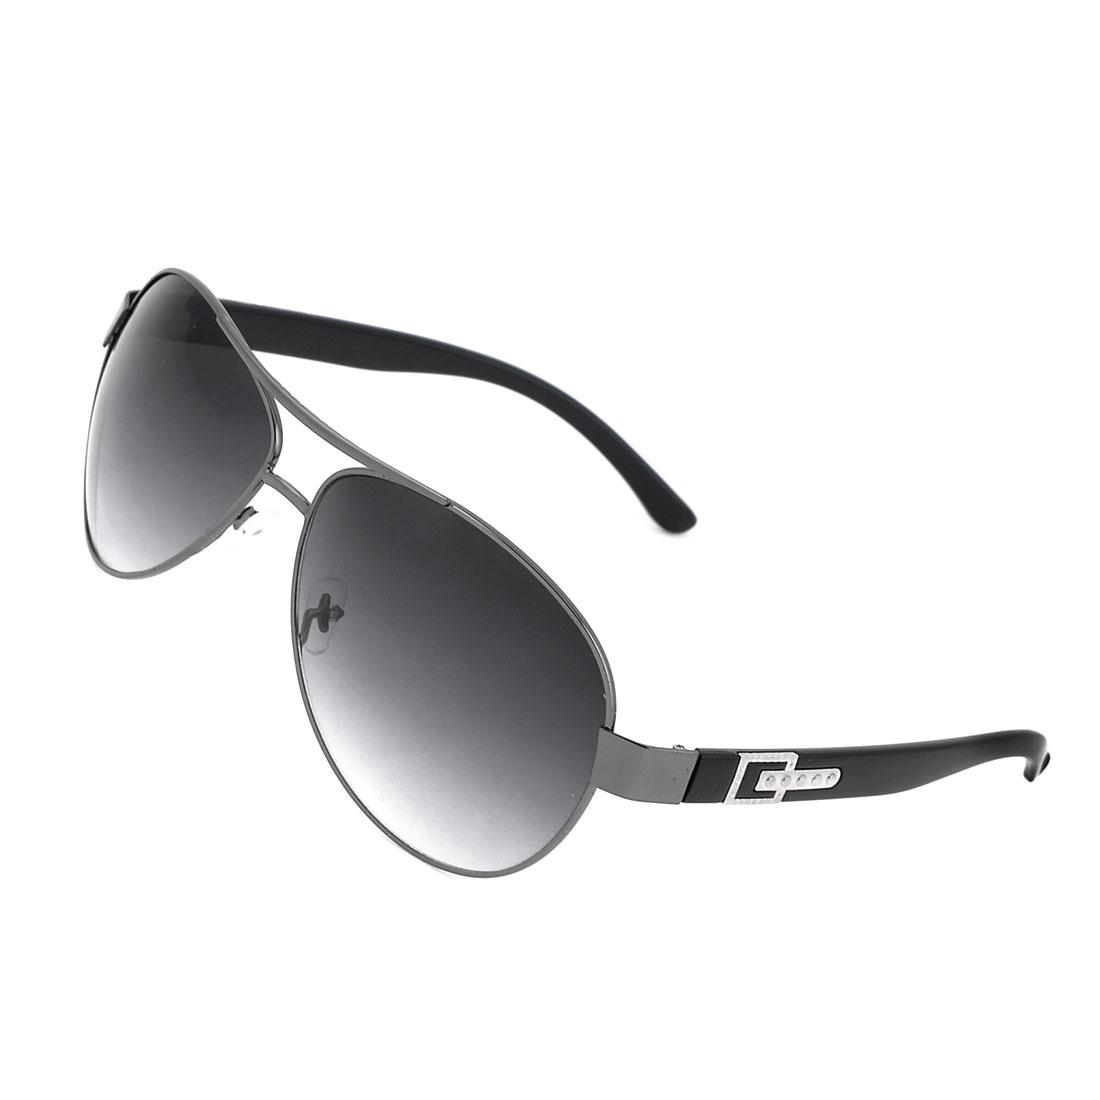 Man Fishing Metal Rim Black Lens Plastic Arms Protective Glasses